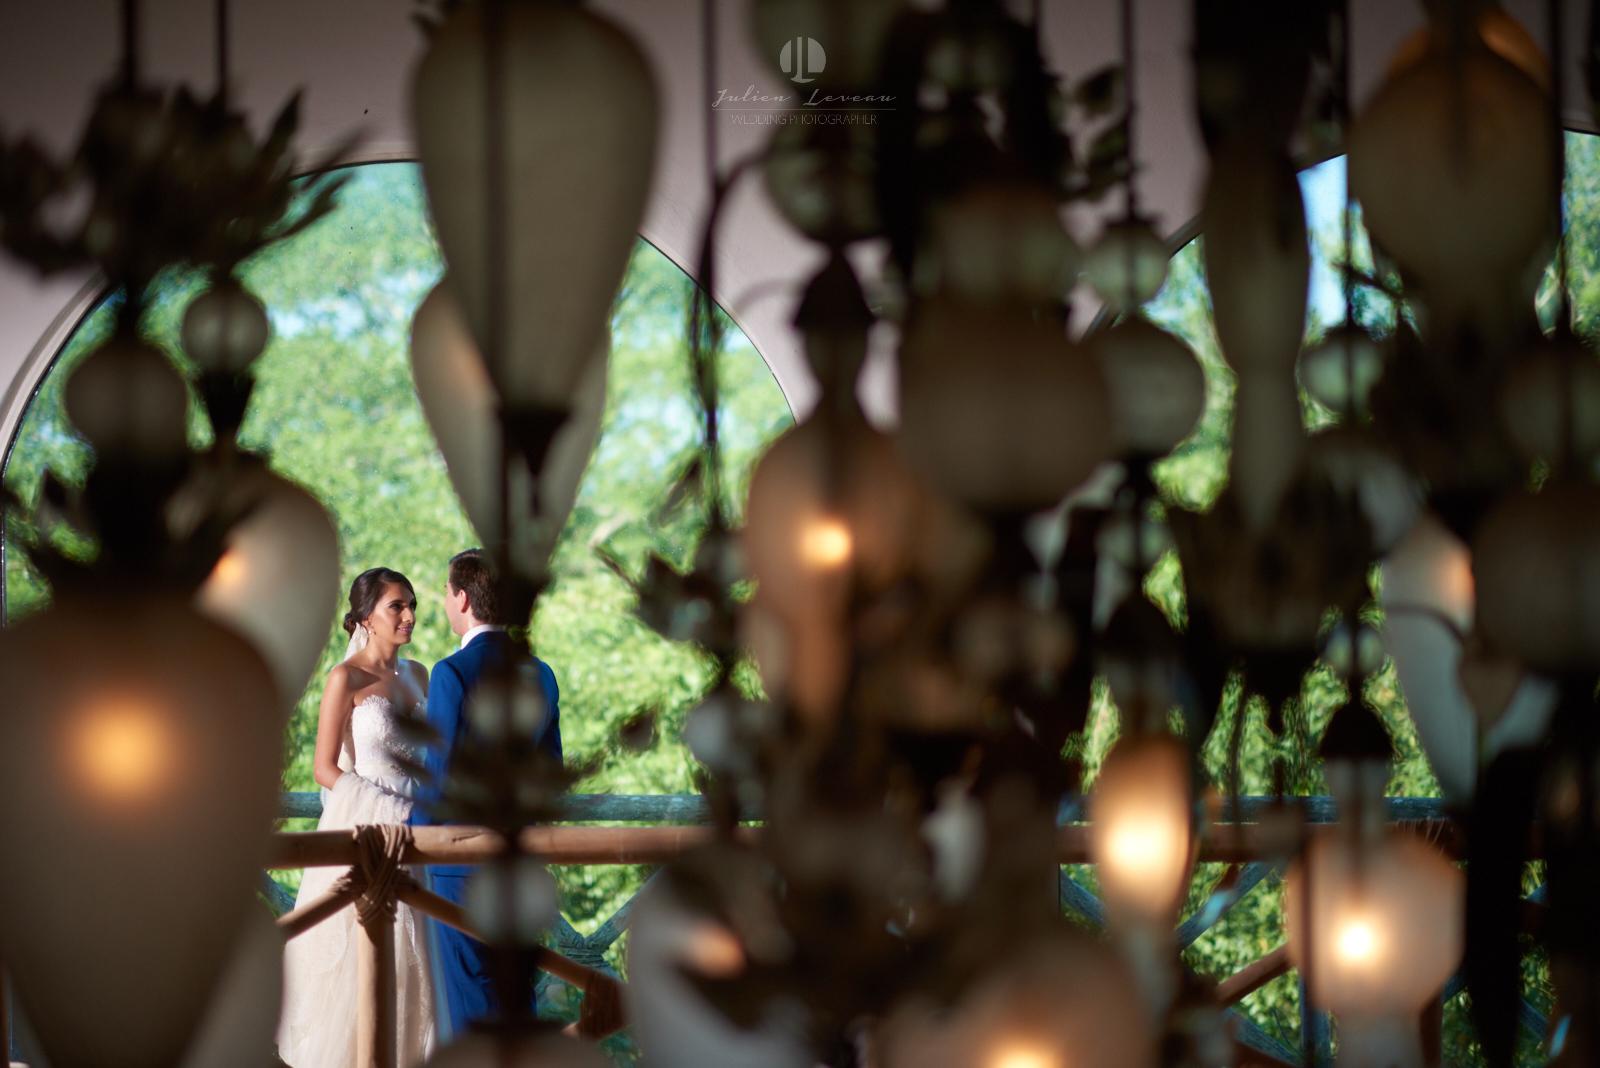 Wedding Photographer in San Pancho Nayarit - Getting married in Hacienda